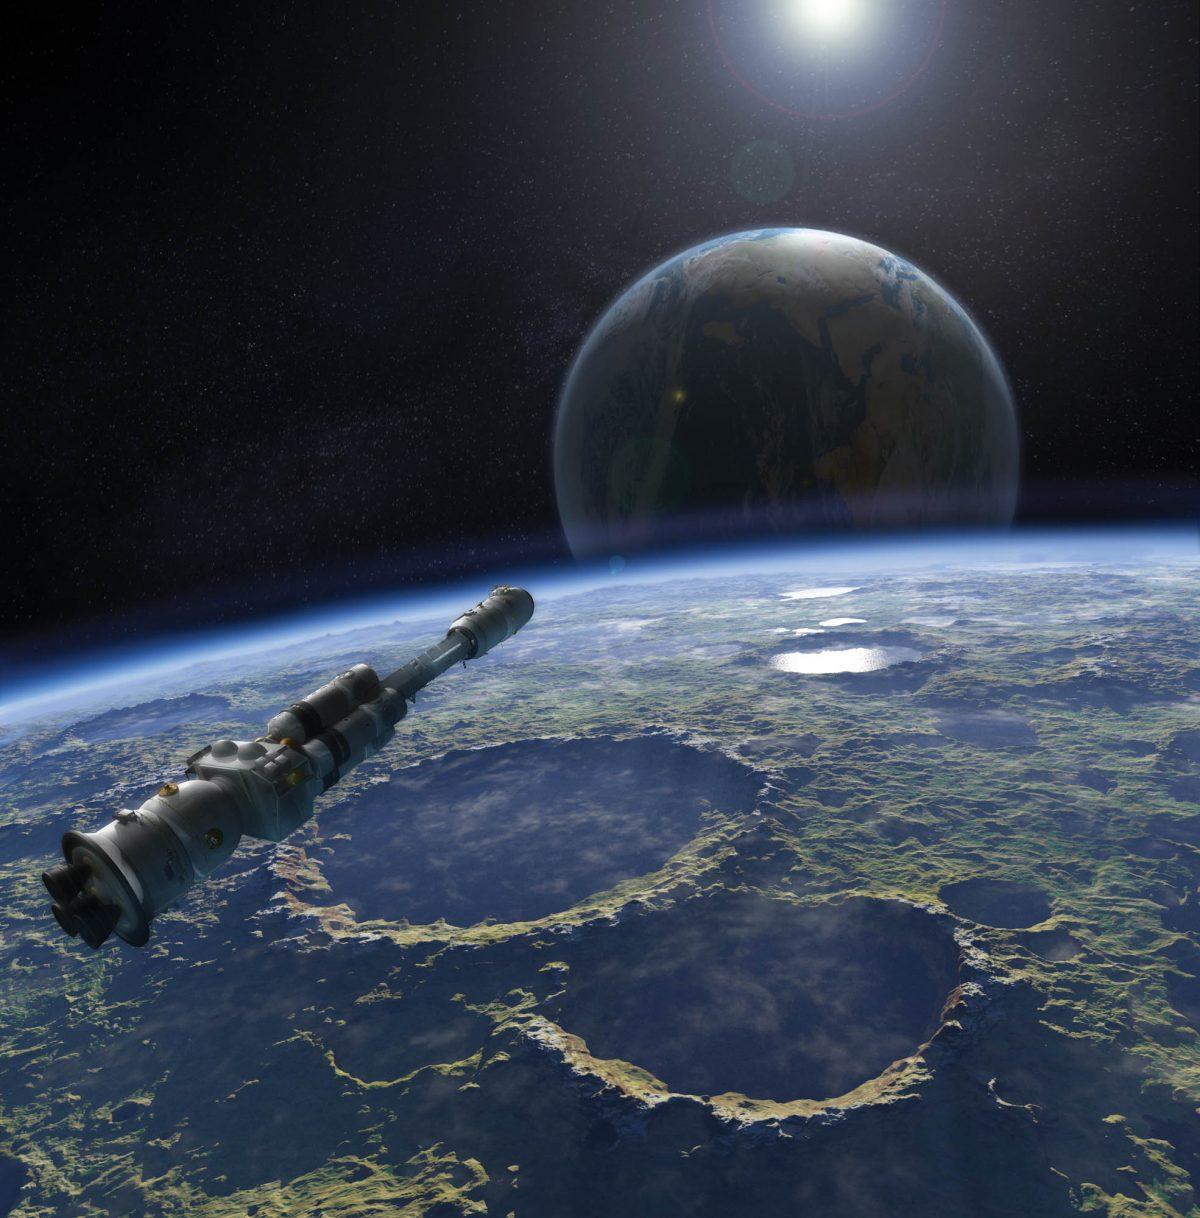 2018-05-16_5afc8b1591f83_terraformed_moon-1200x1218.jpg